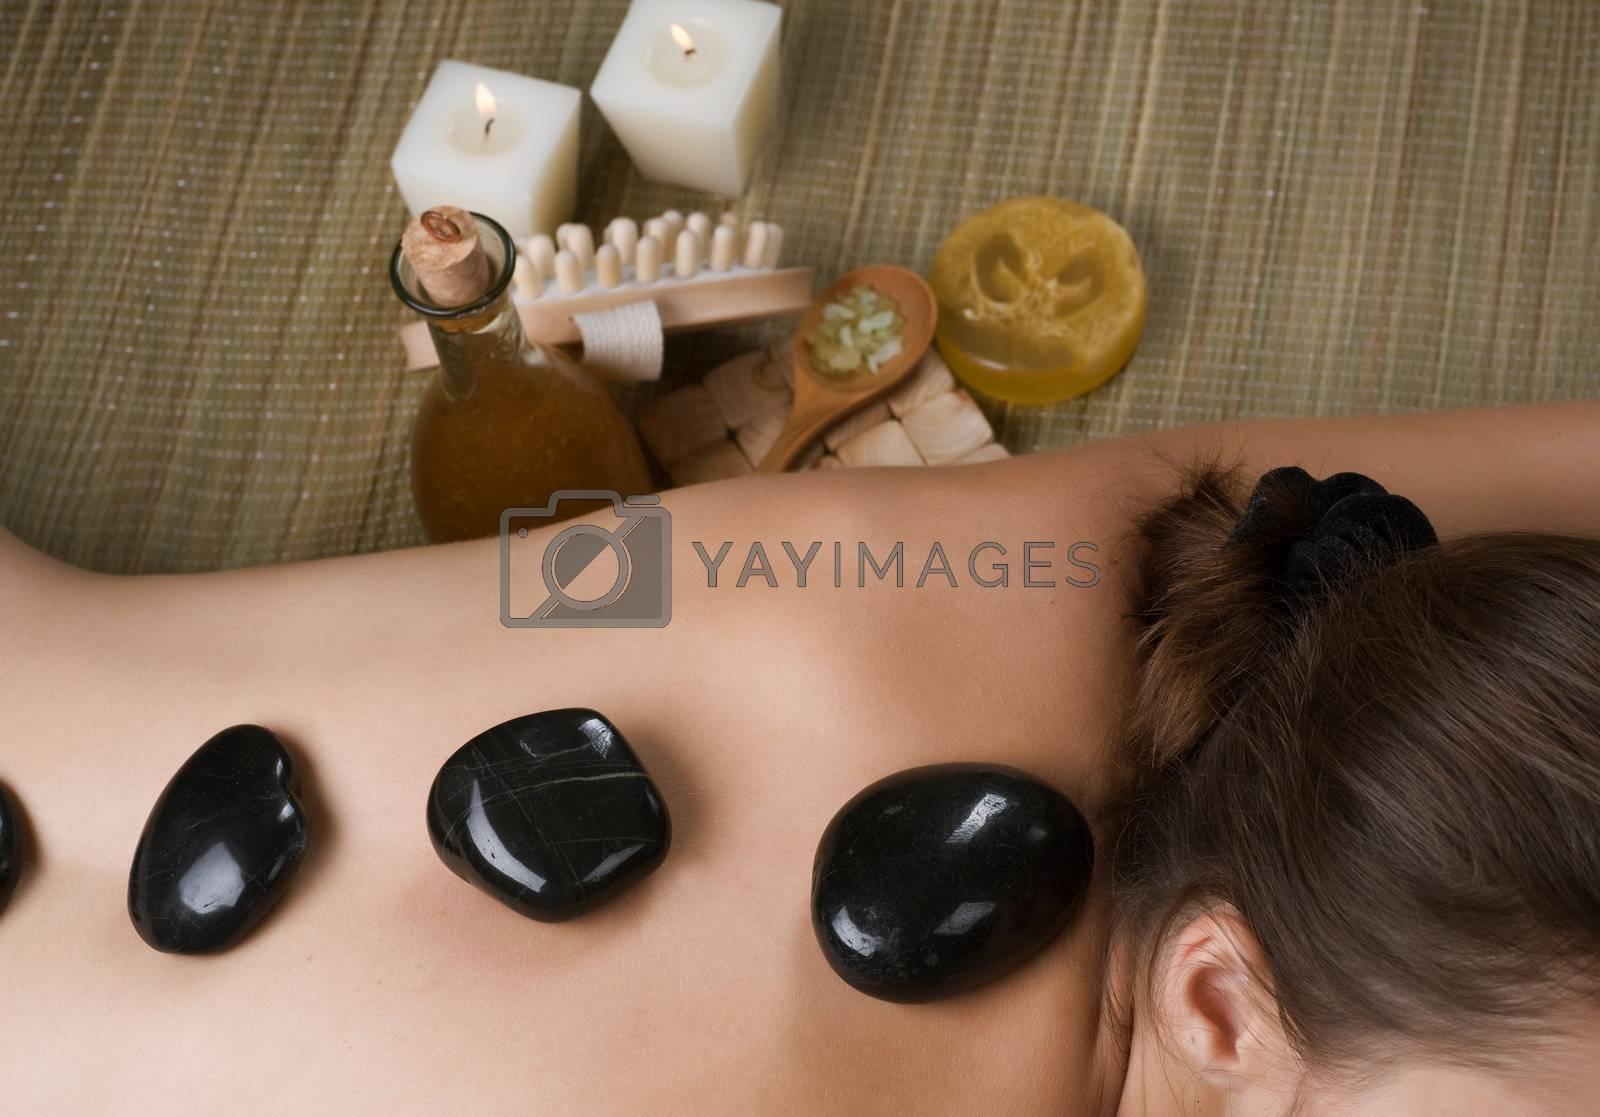 Spa. Hot Stone Massage by Subbotina Anna